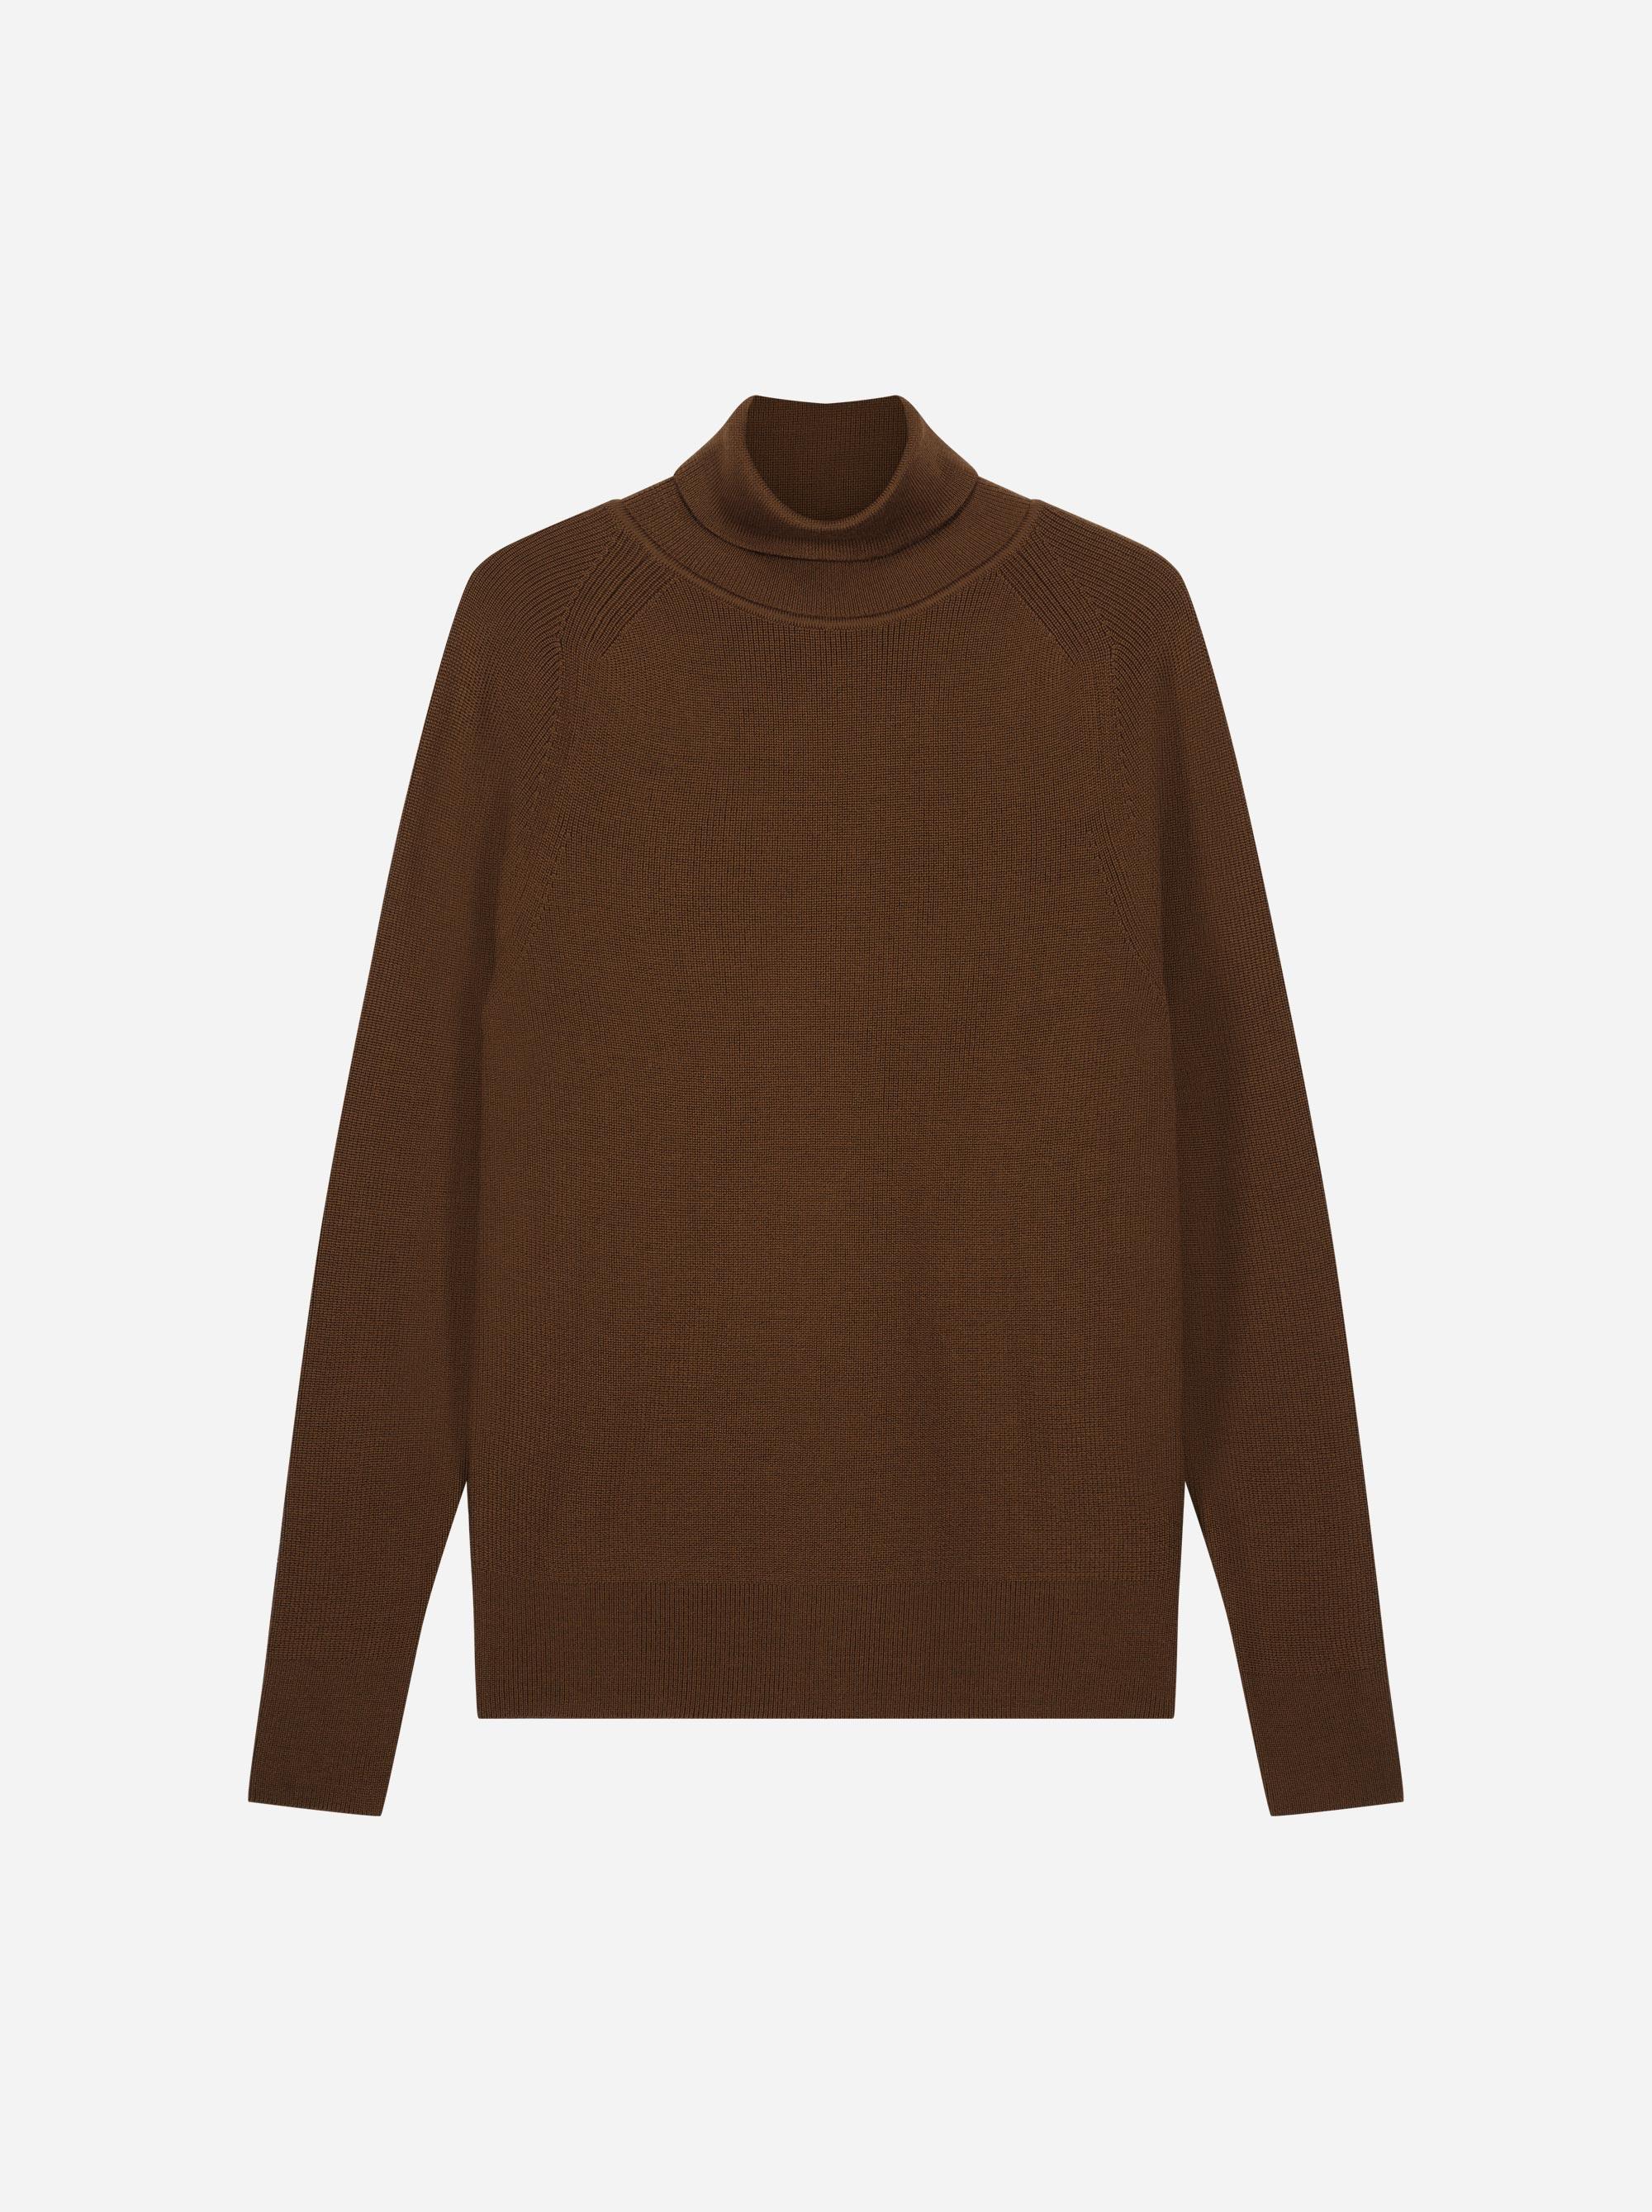 Teym_Merino-Sweater-Turtleneck_Dark_Brown_front_1